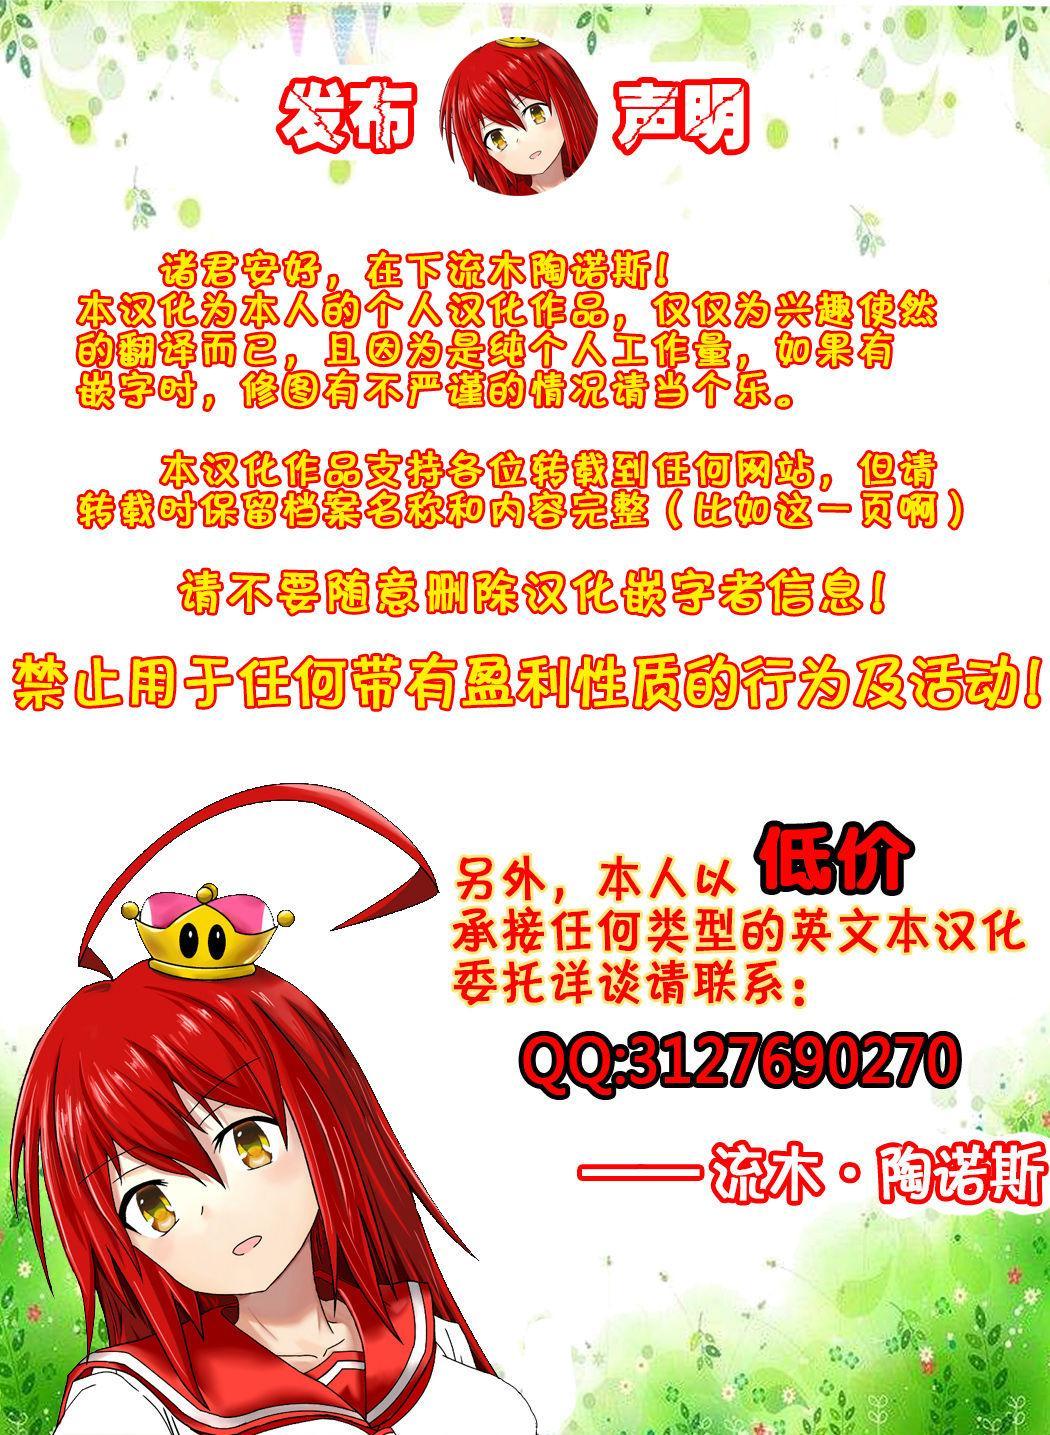 [Merkonig] B-Trayal 19-2 (Sword Art Online) [Chinese] [流木个人汉化] 16